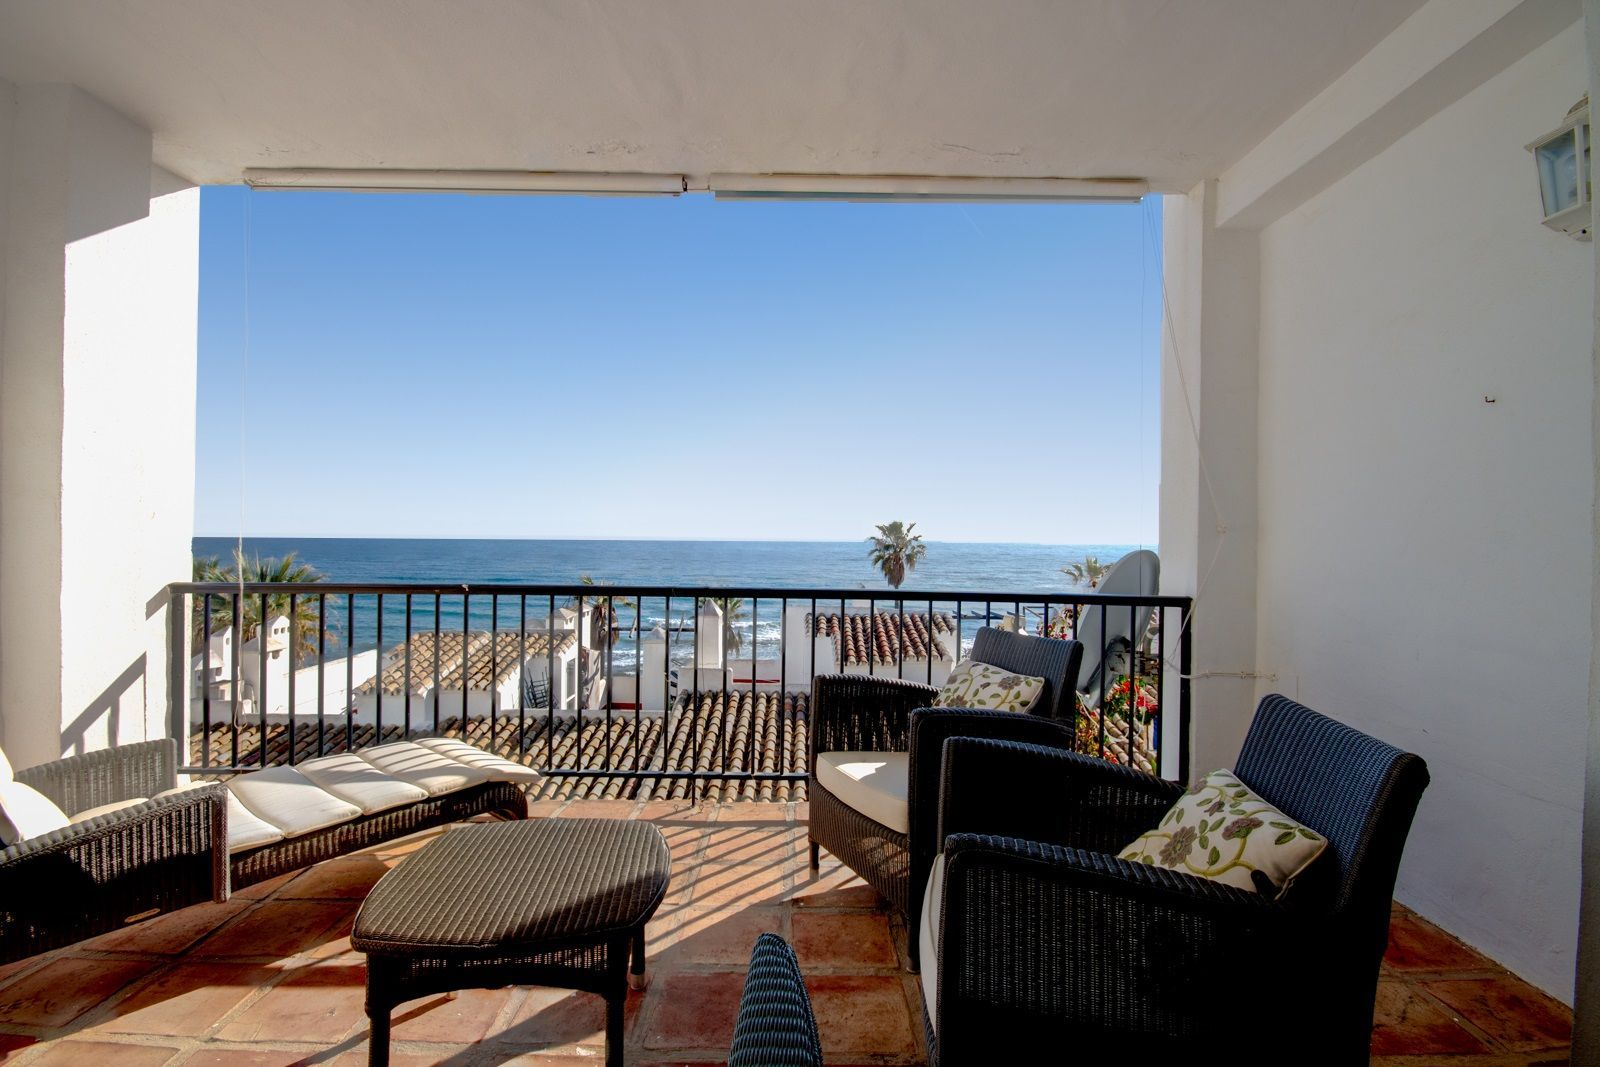 2-bedroom flat with sea view in Mijas Costa